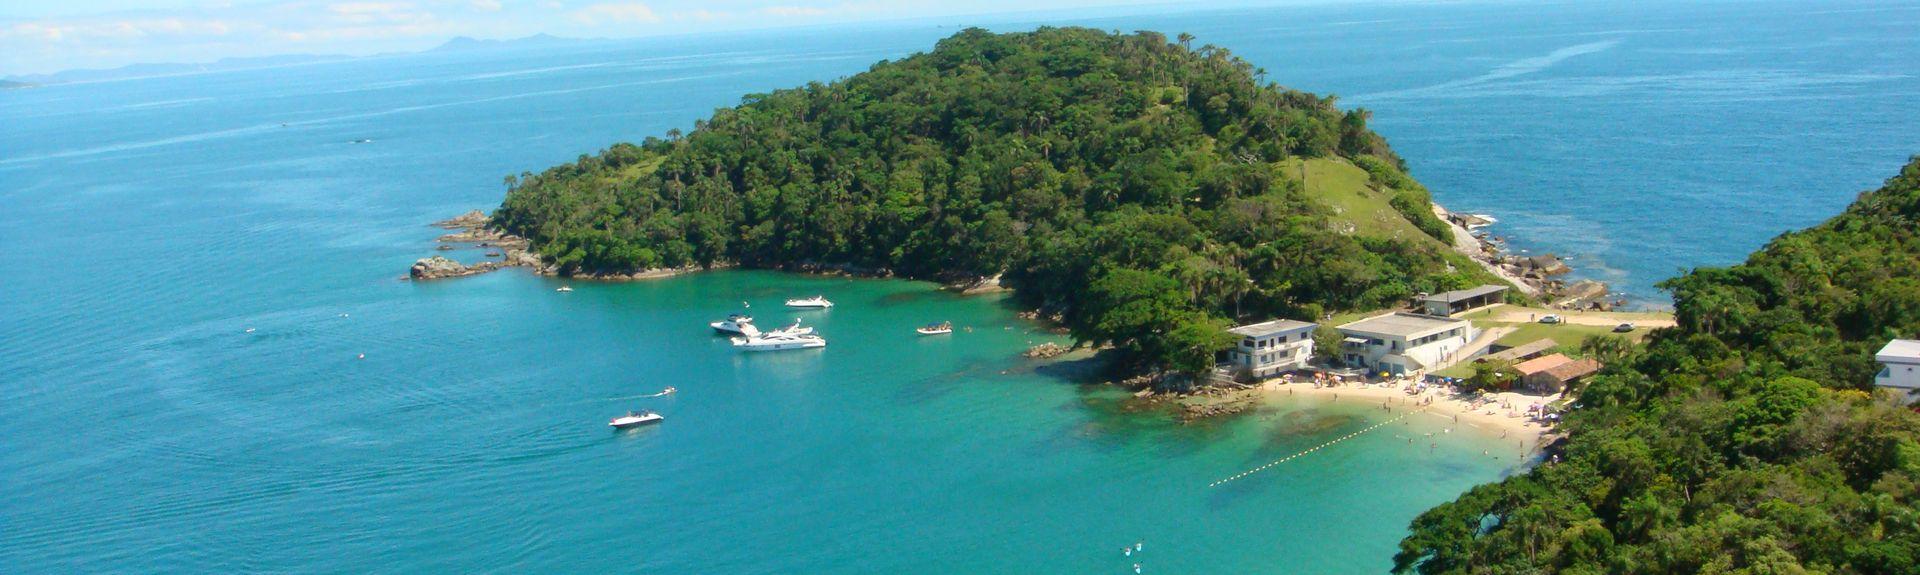 Quatro Ilhas, Bombinhas, Santa Catarina State, Brazil